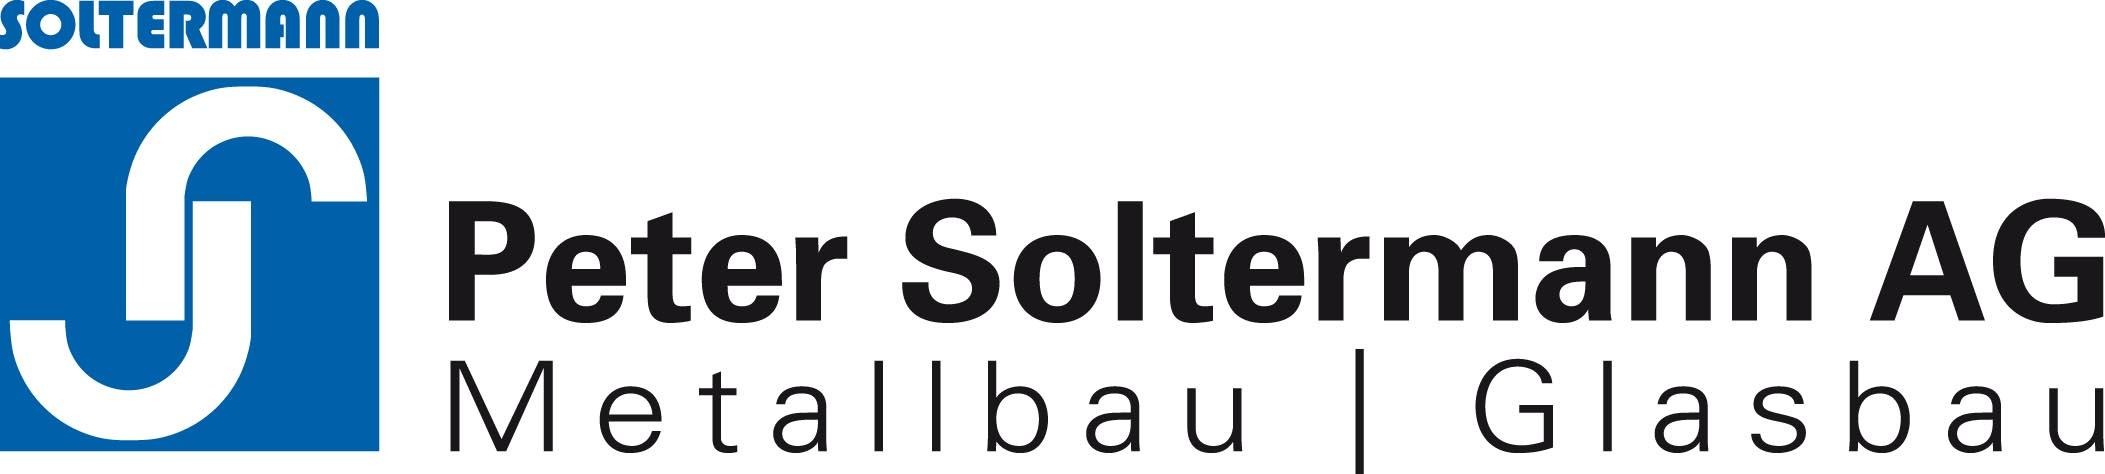 Peter Soltermann AG